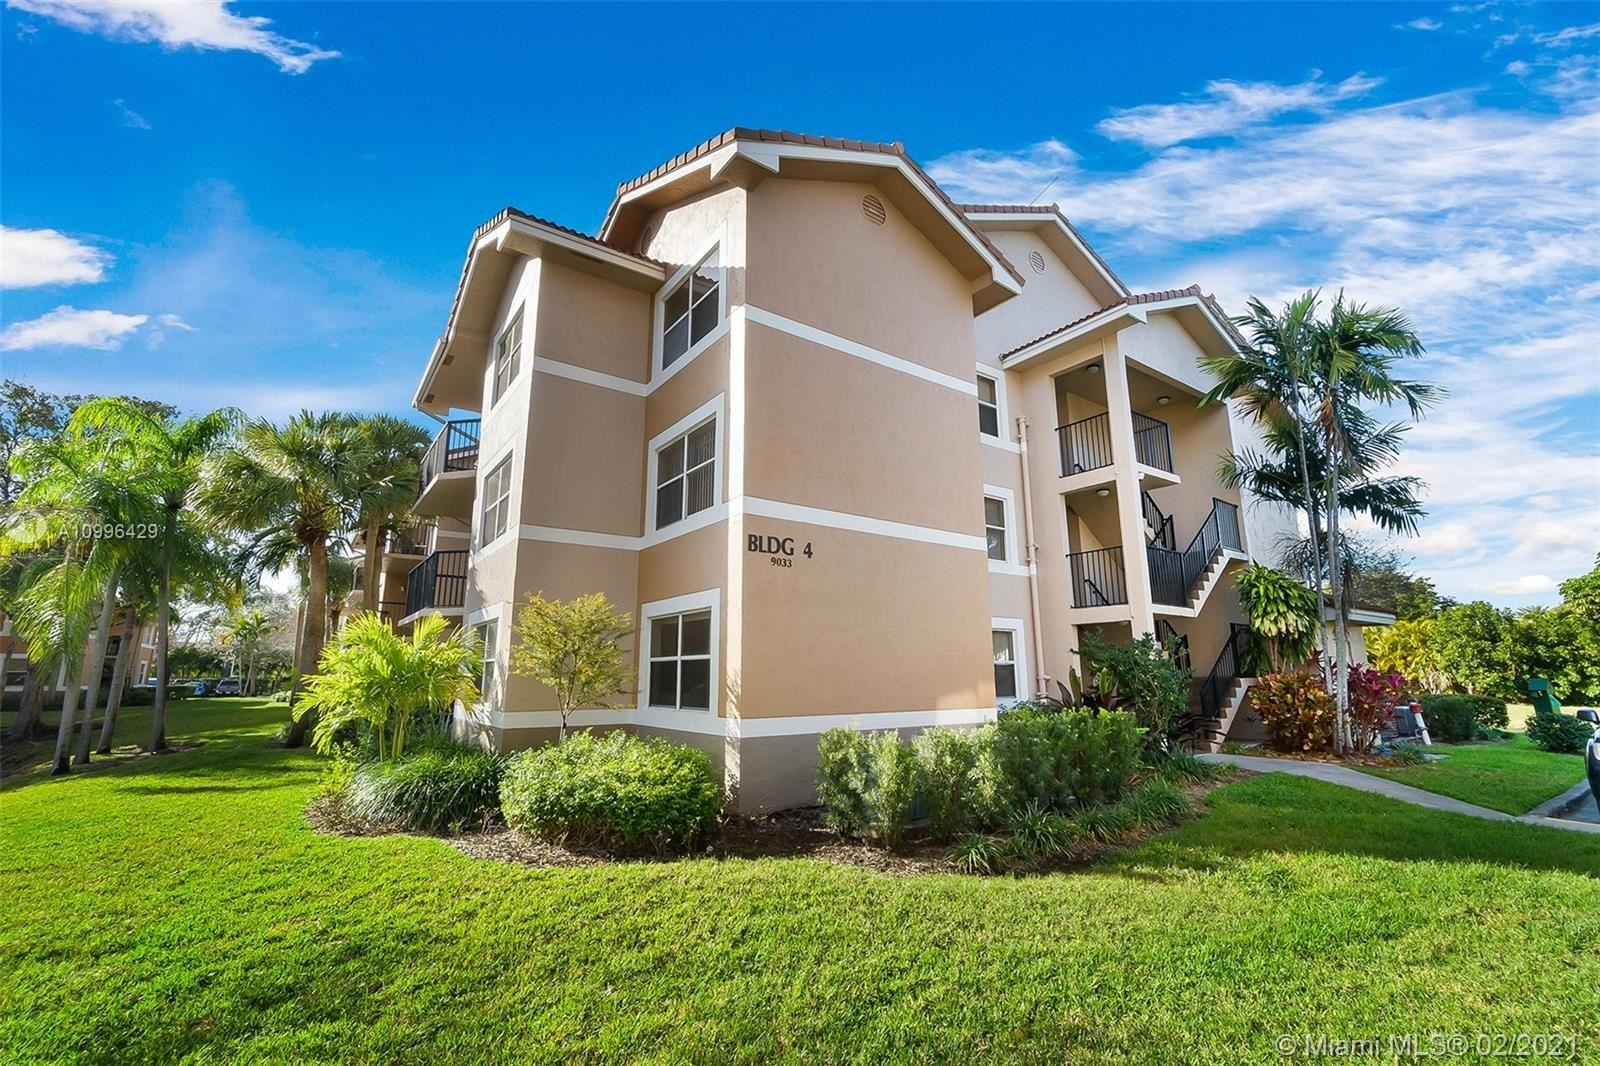 9033 Wiles Rd #301, Coral Springs, FL 33067 - MLS#: A10996429